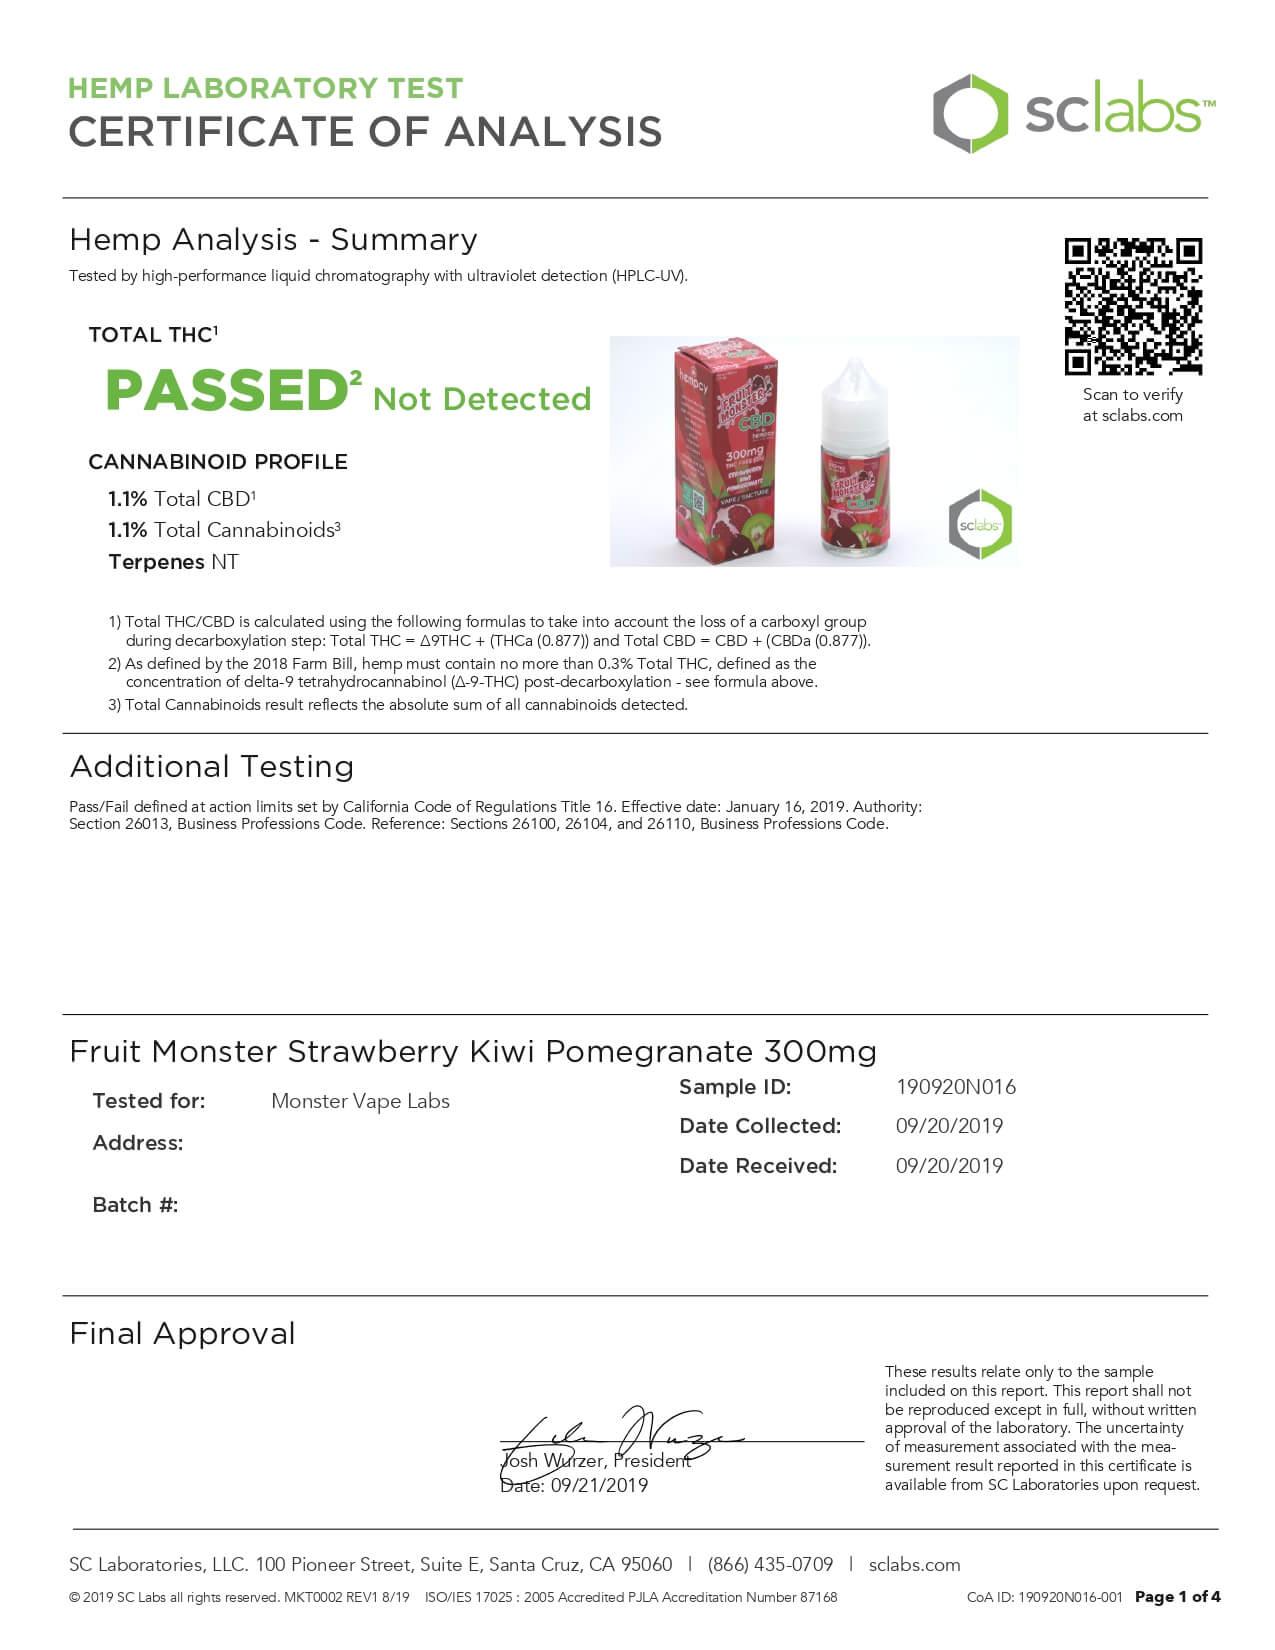 Fruit Monster CBD Vape Strawberry Kiwi Pomegranate 300mg Lab Report